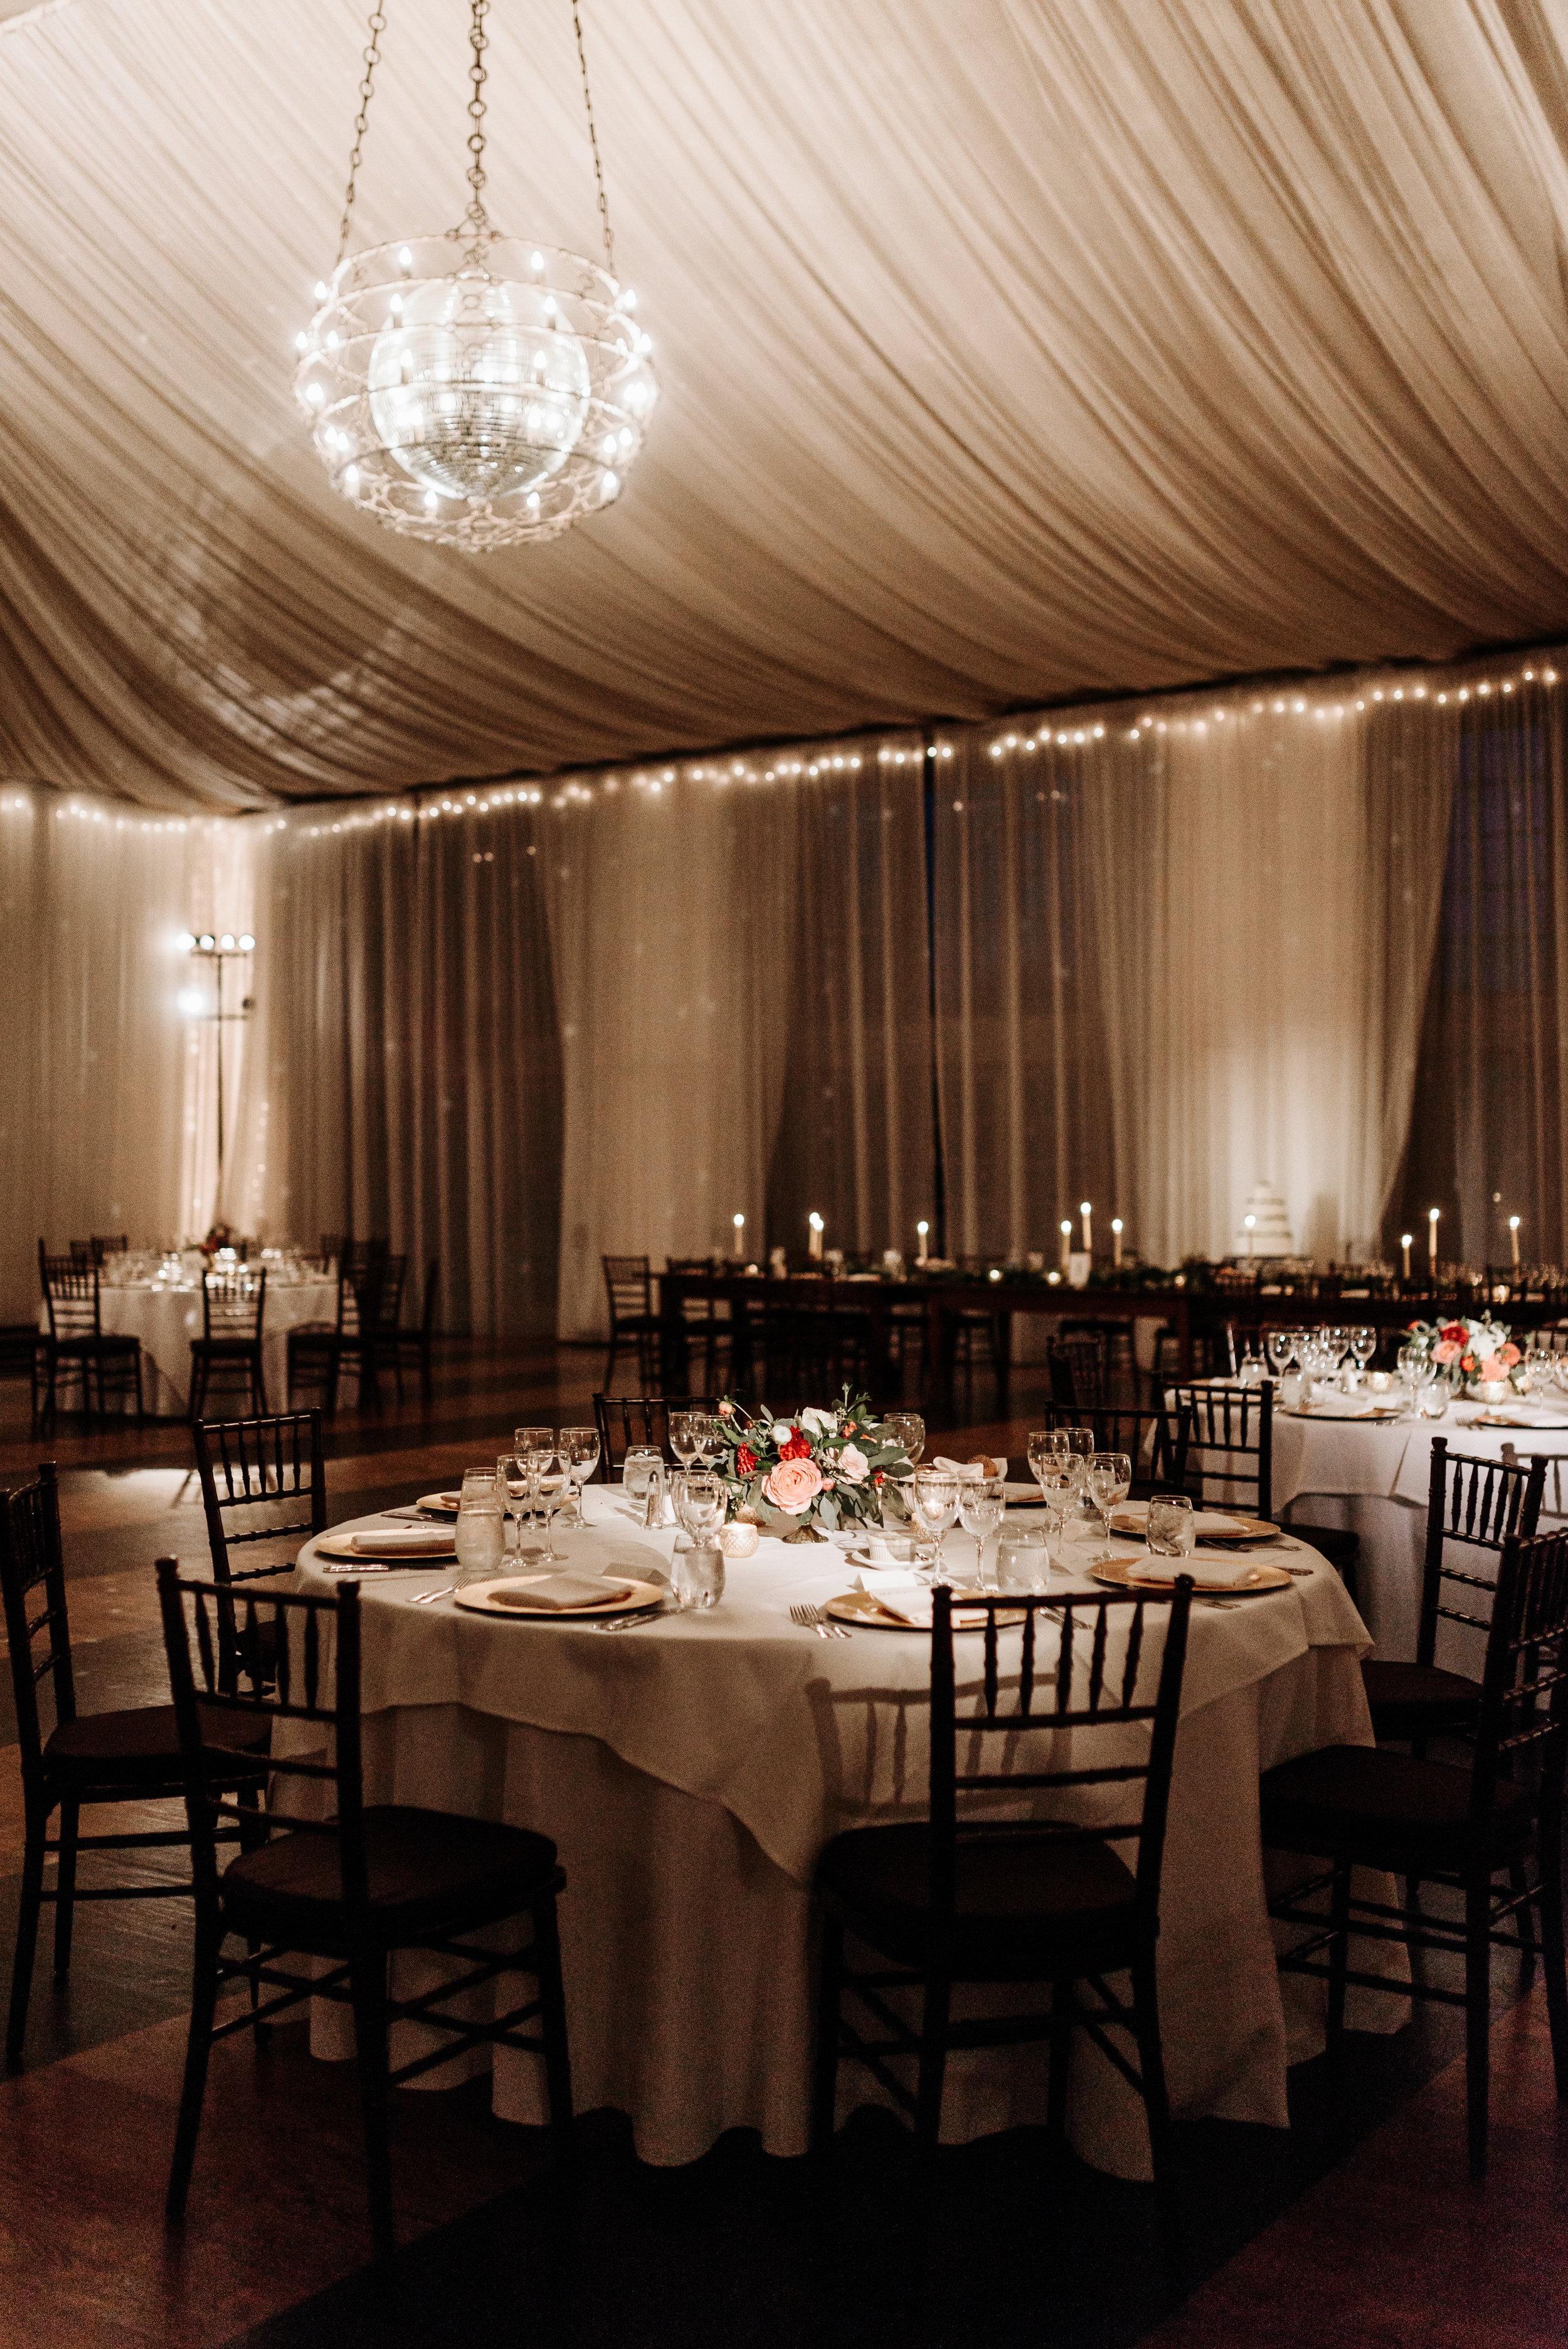 Veritas-Vineyards-and-Winery-Wedding-Photography-Afton-Virginia-Yasmin-Seth-Photography-by-V-9805.jpg